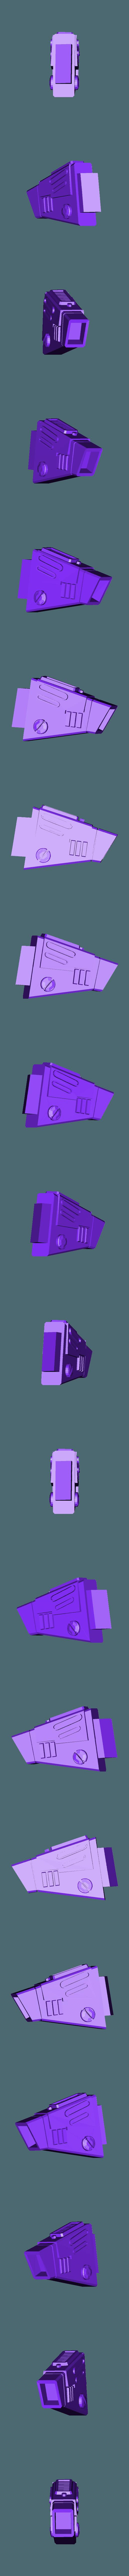 2Storm_Surge_JetX2_repaired.stl Download free OBJ file Tempest Rush Mech • 3D printer model, Leesedrenfort